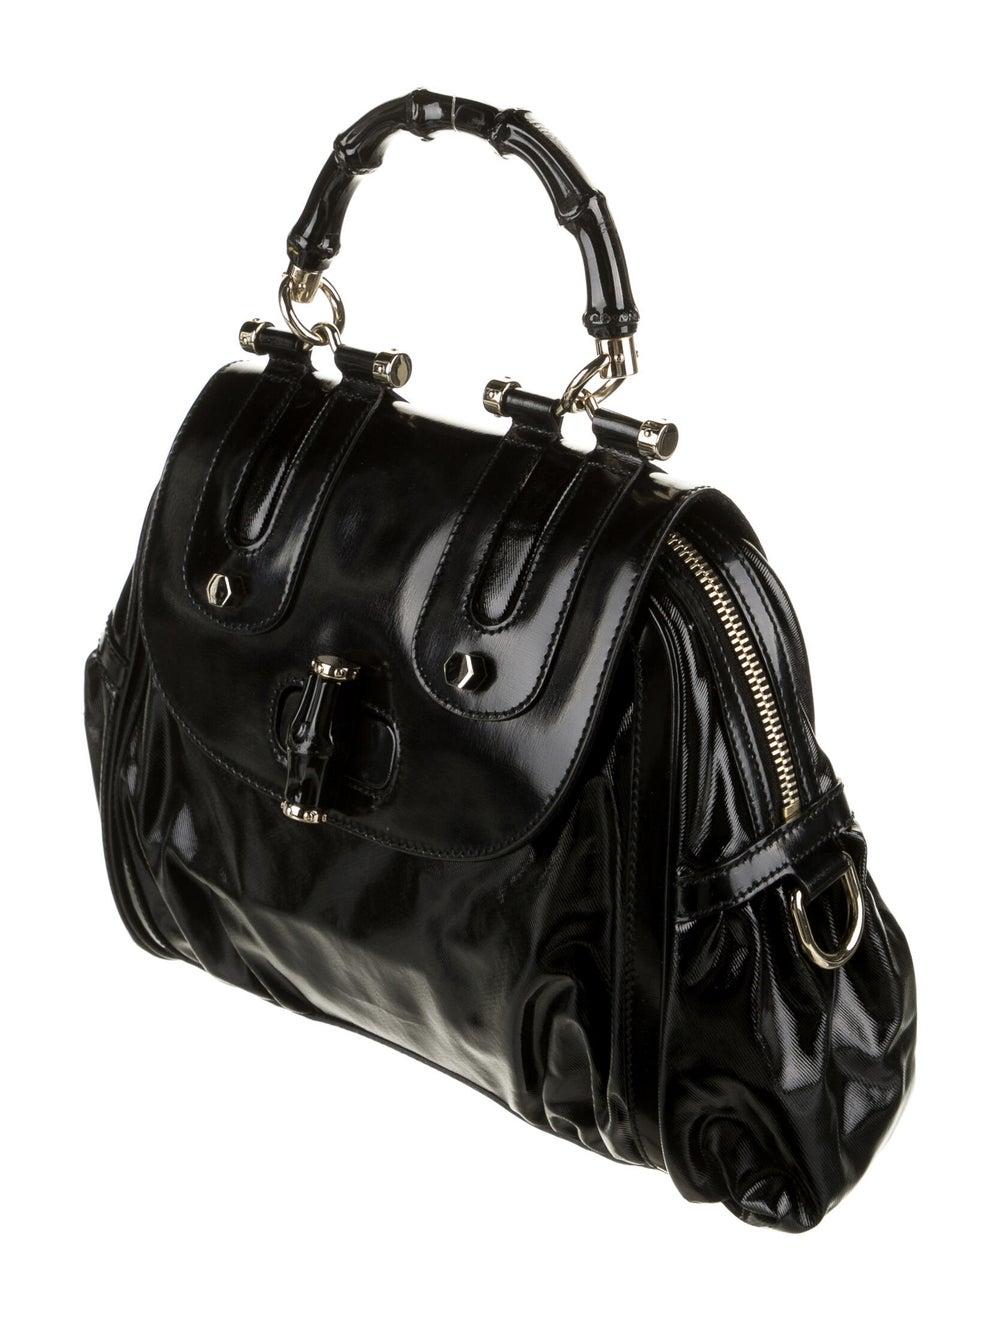 Gucci Pop Bamboo Handle Bag Black - image 3